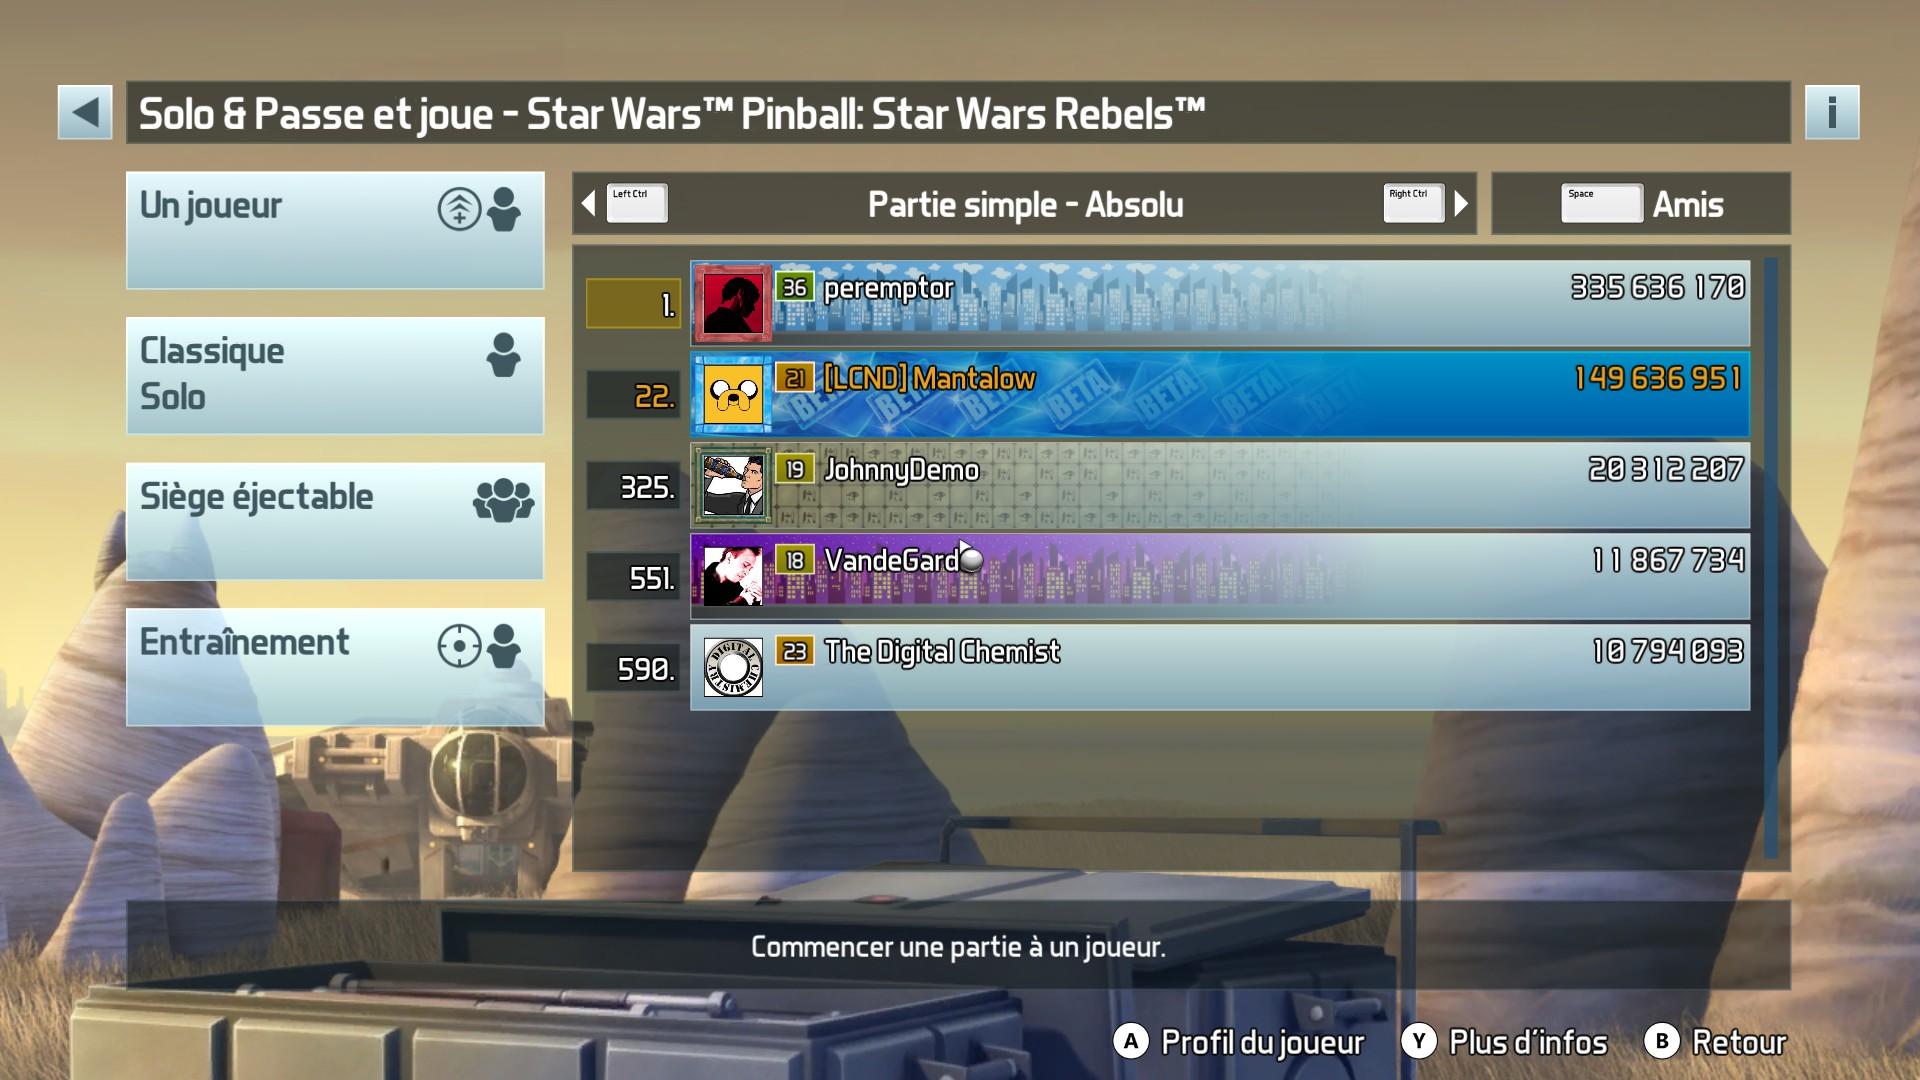 Mantalow: Pinball FX3: Star Wars Pinball: Star Wars Rebels (PC) 149,636,951 points on 2017-10-04 02:40:36